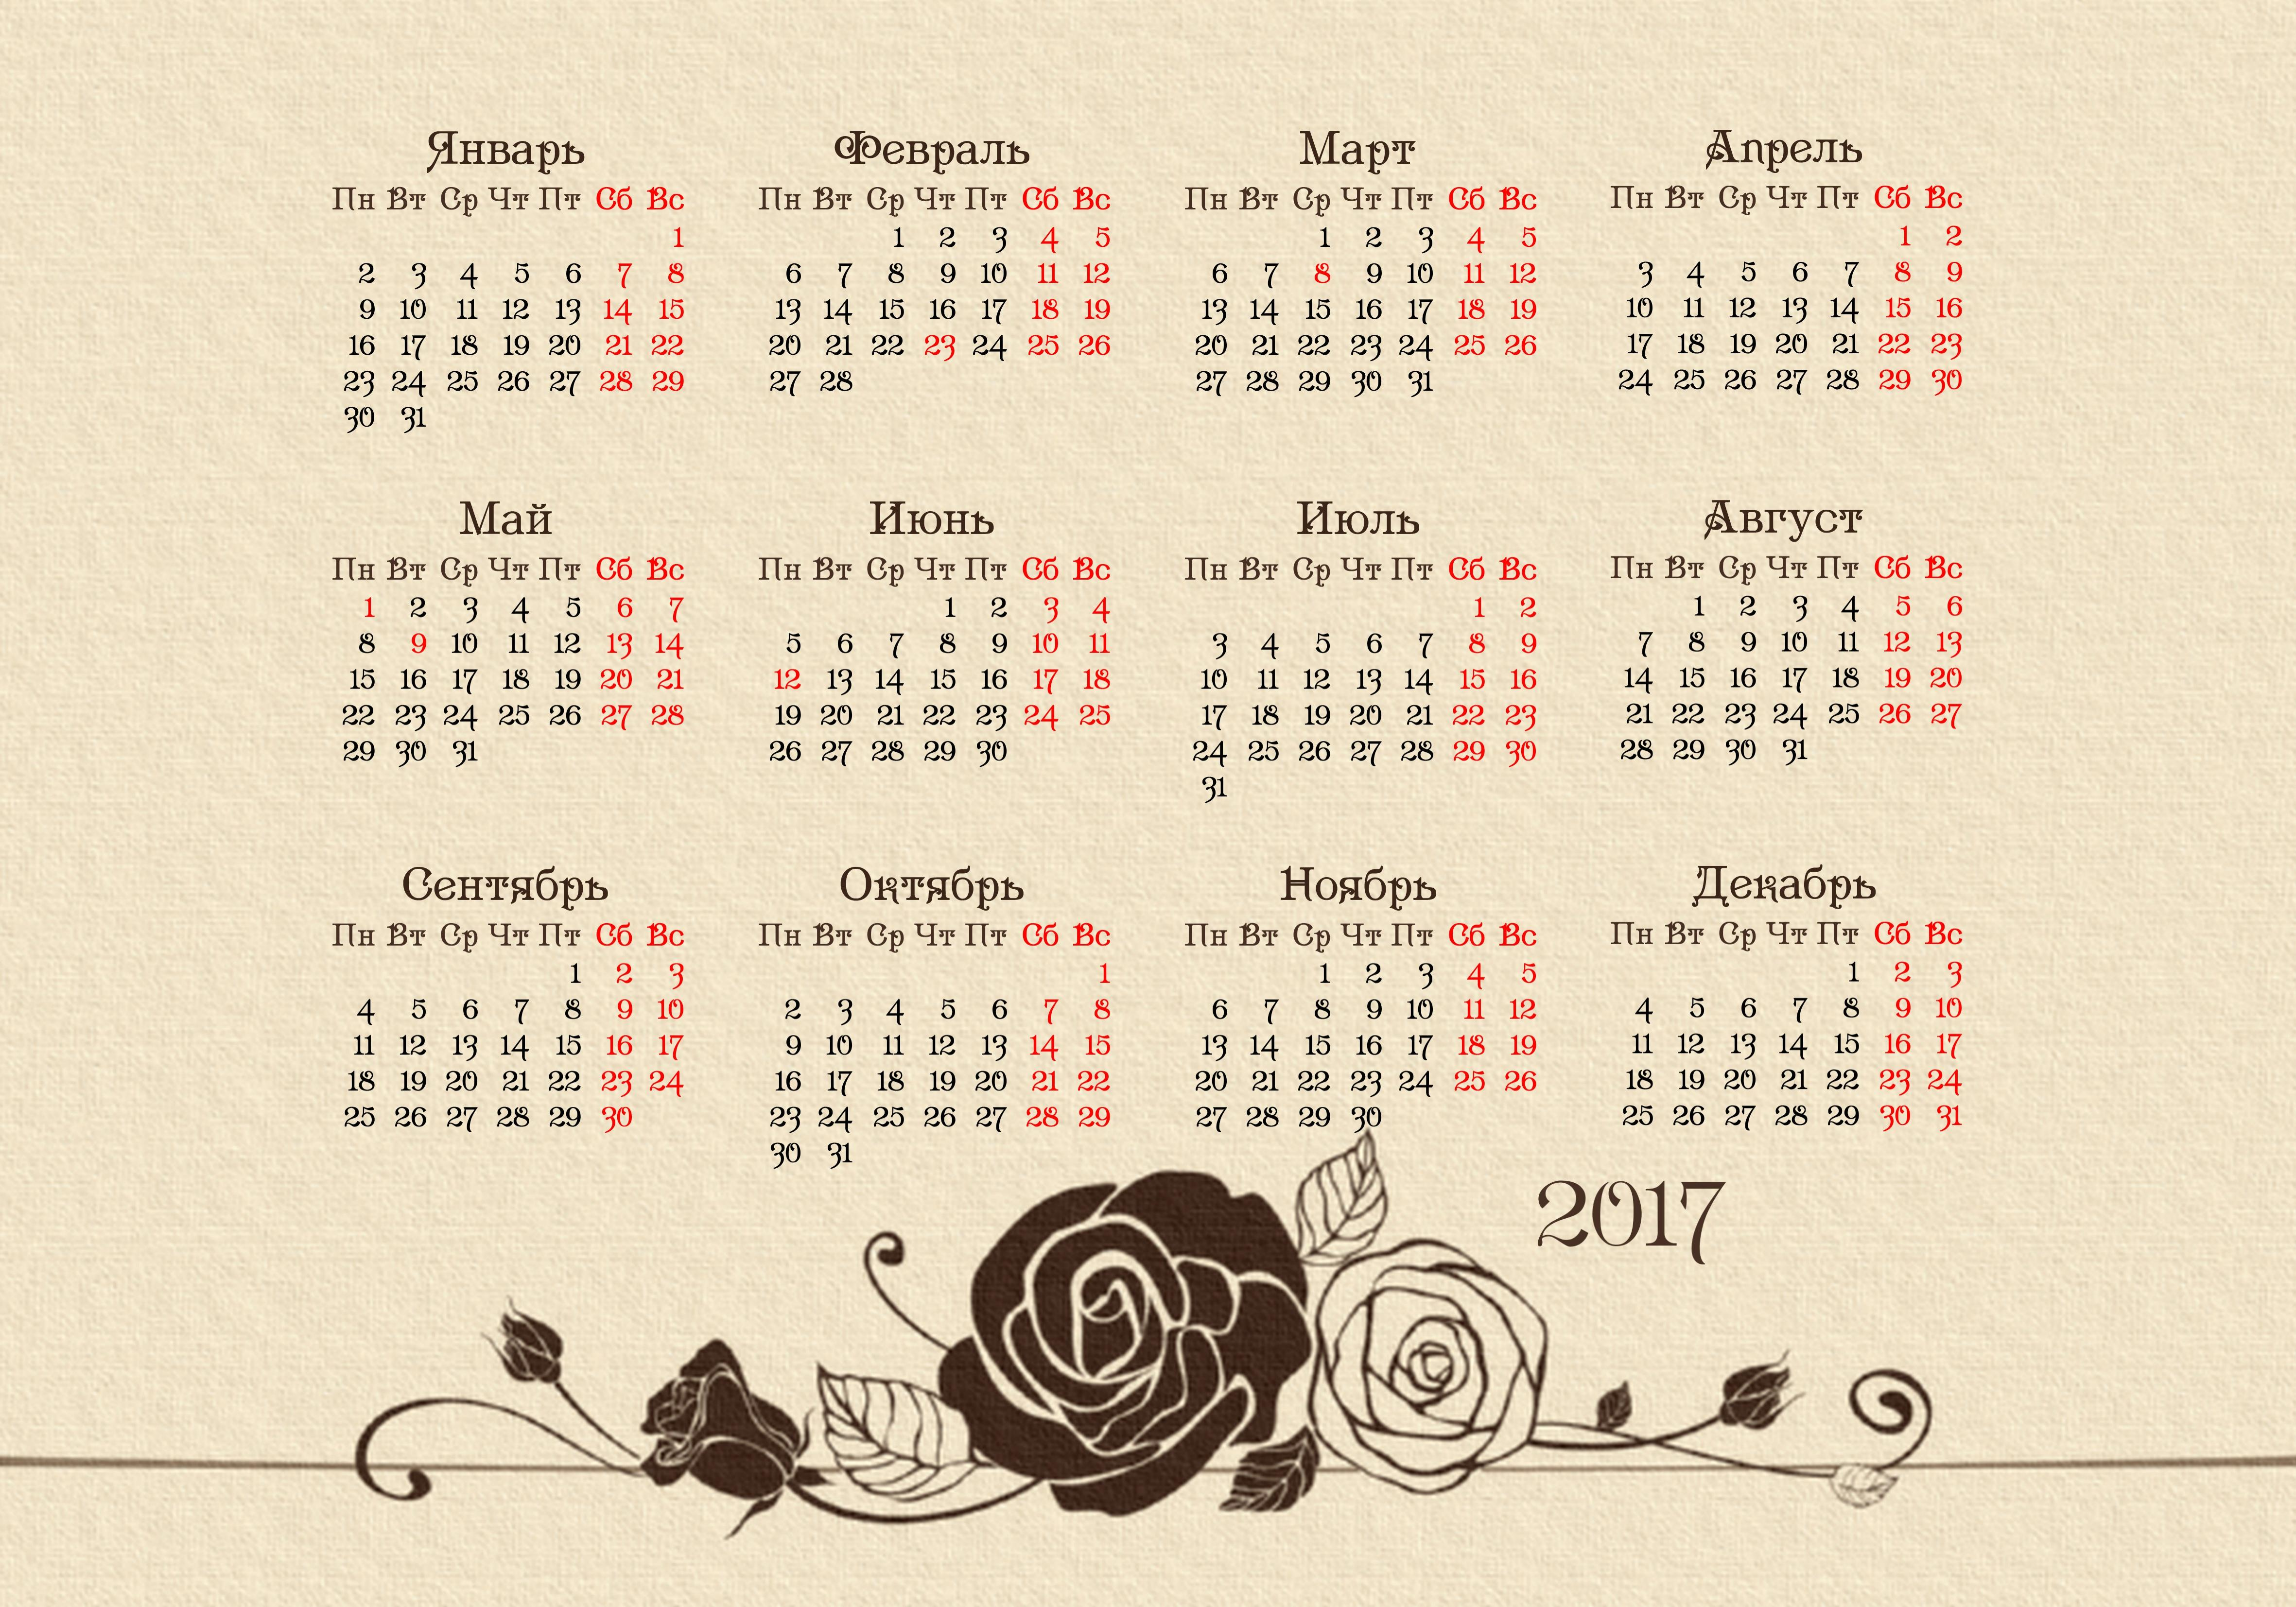 обои календарь на 2017 год, 2017, год петуха, календарная сетка на 2017 годкалендарь на 2017 год картинки фото